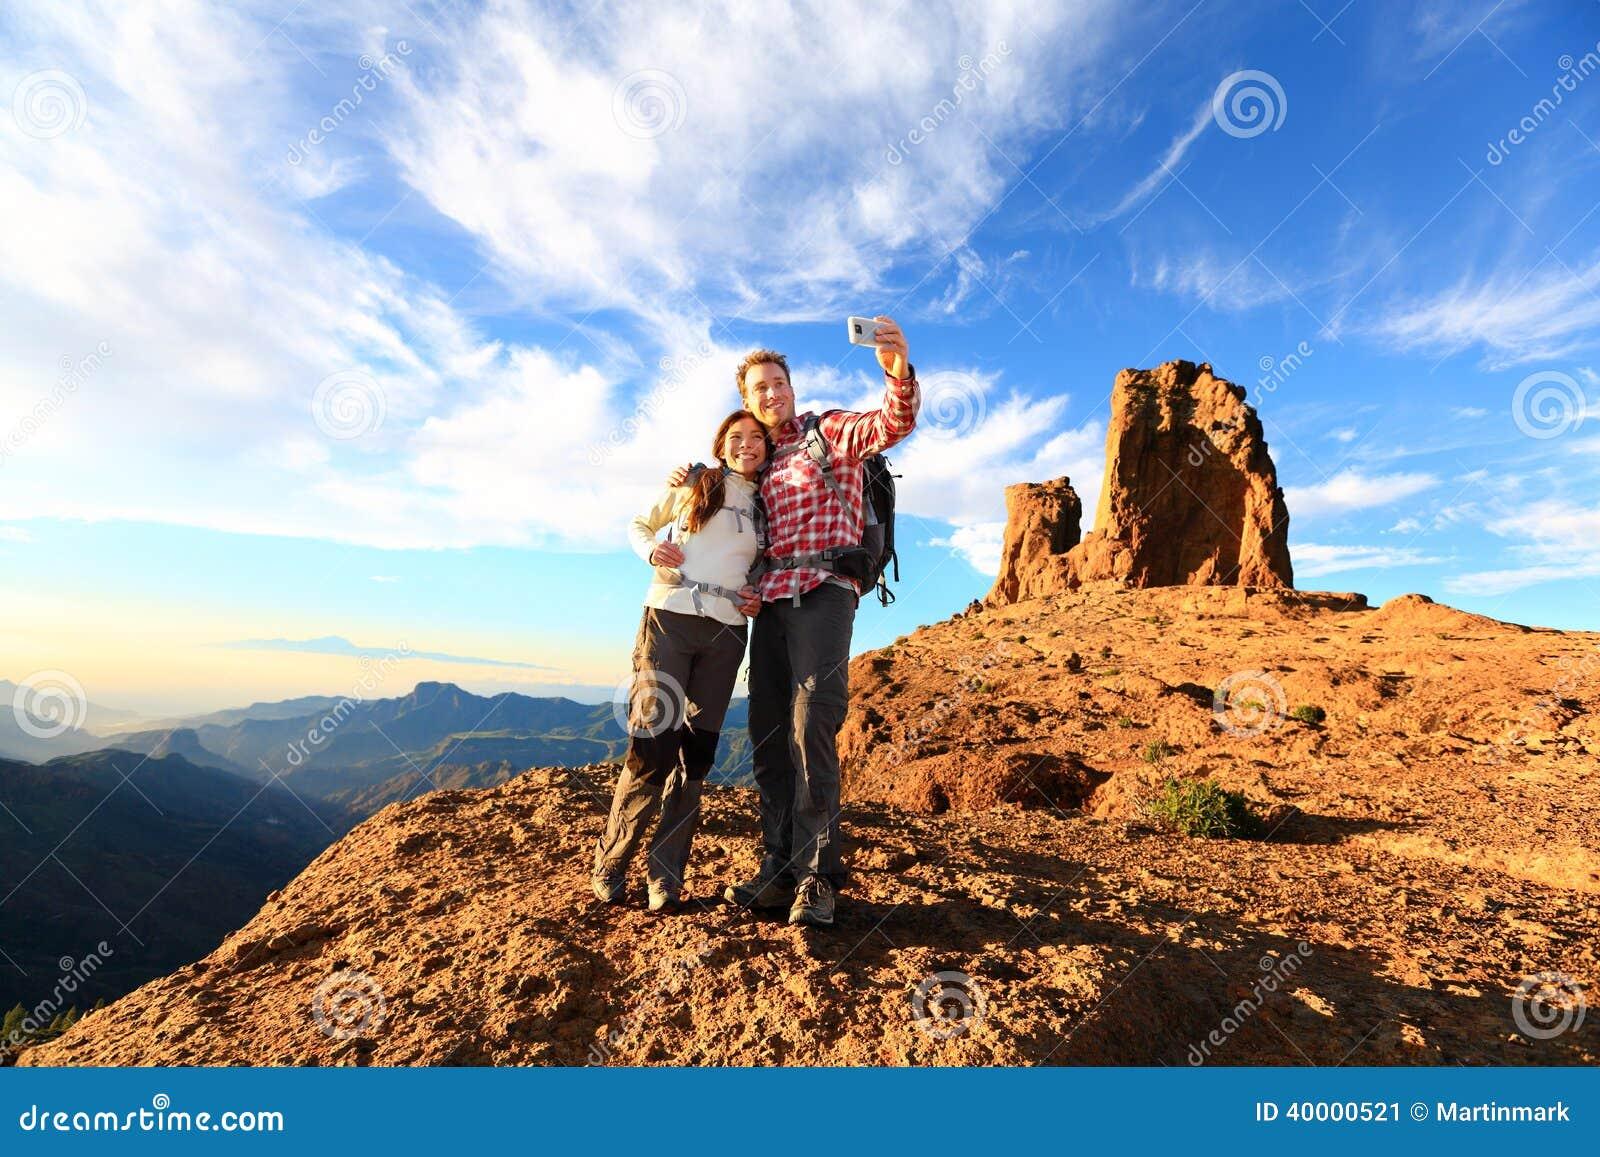 Couple taking selfie hiking in beautiful nature